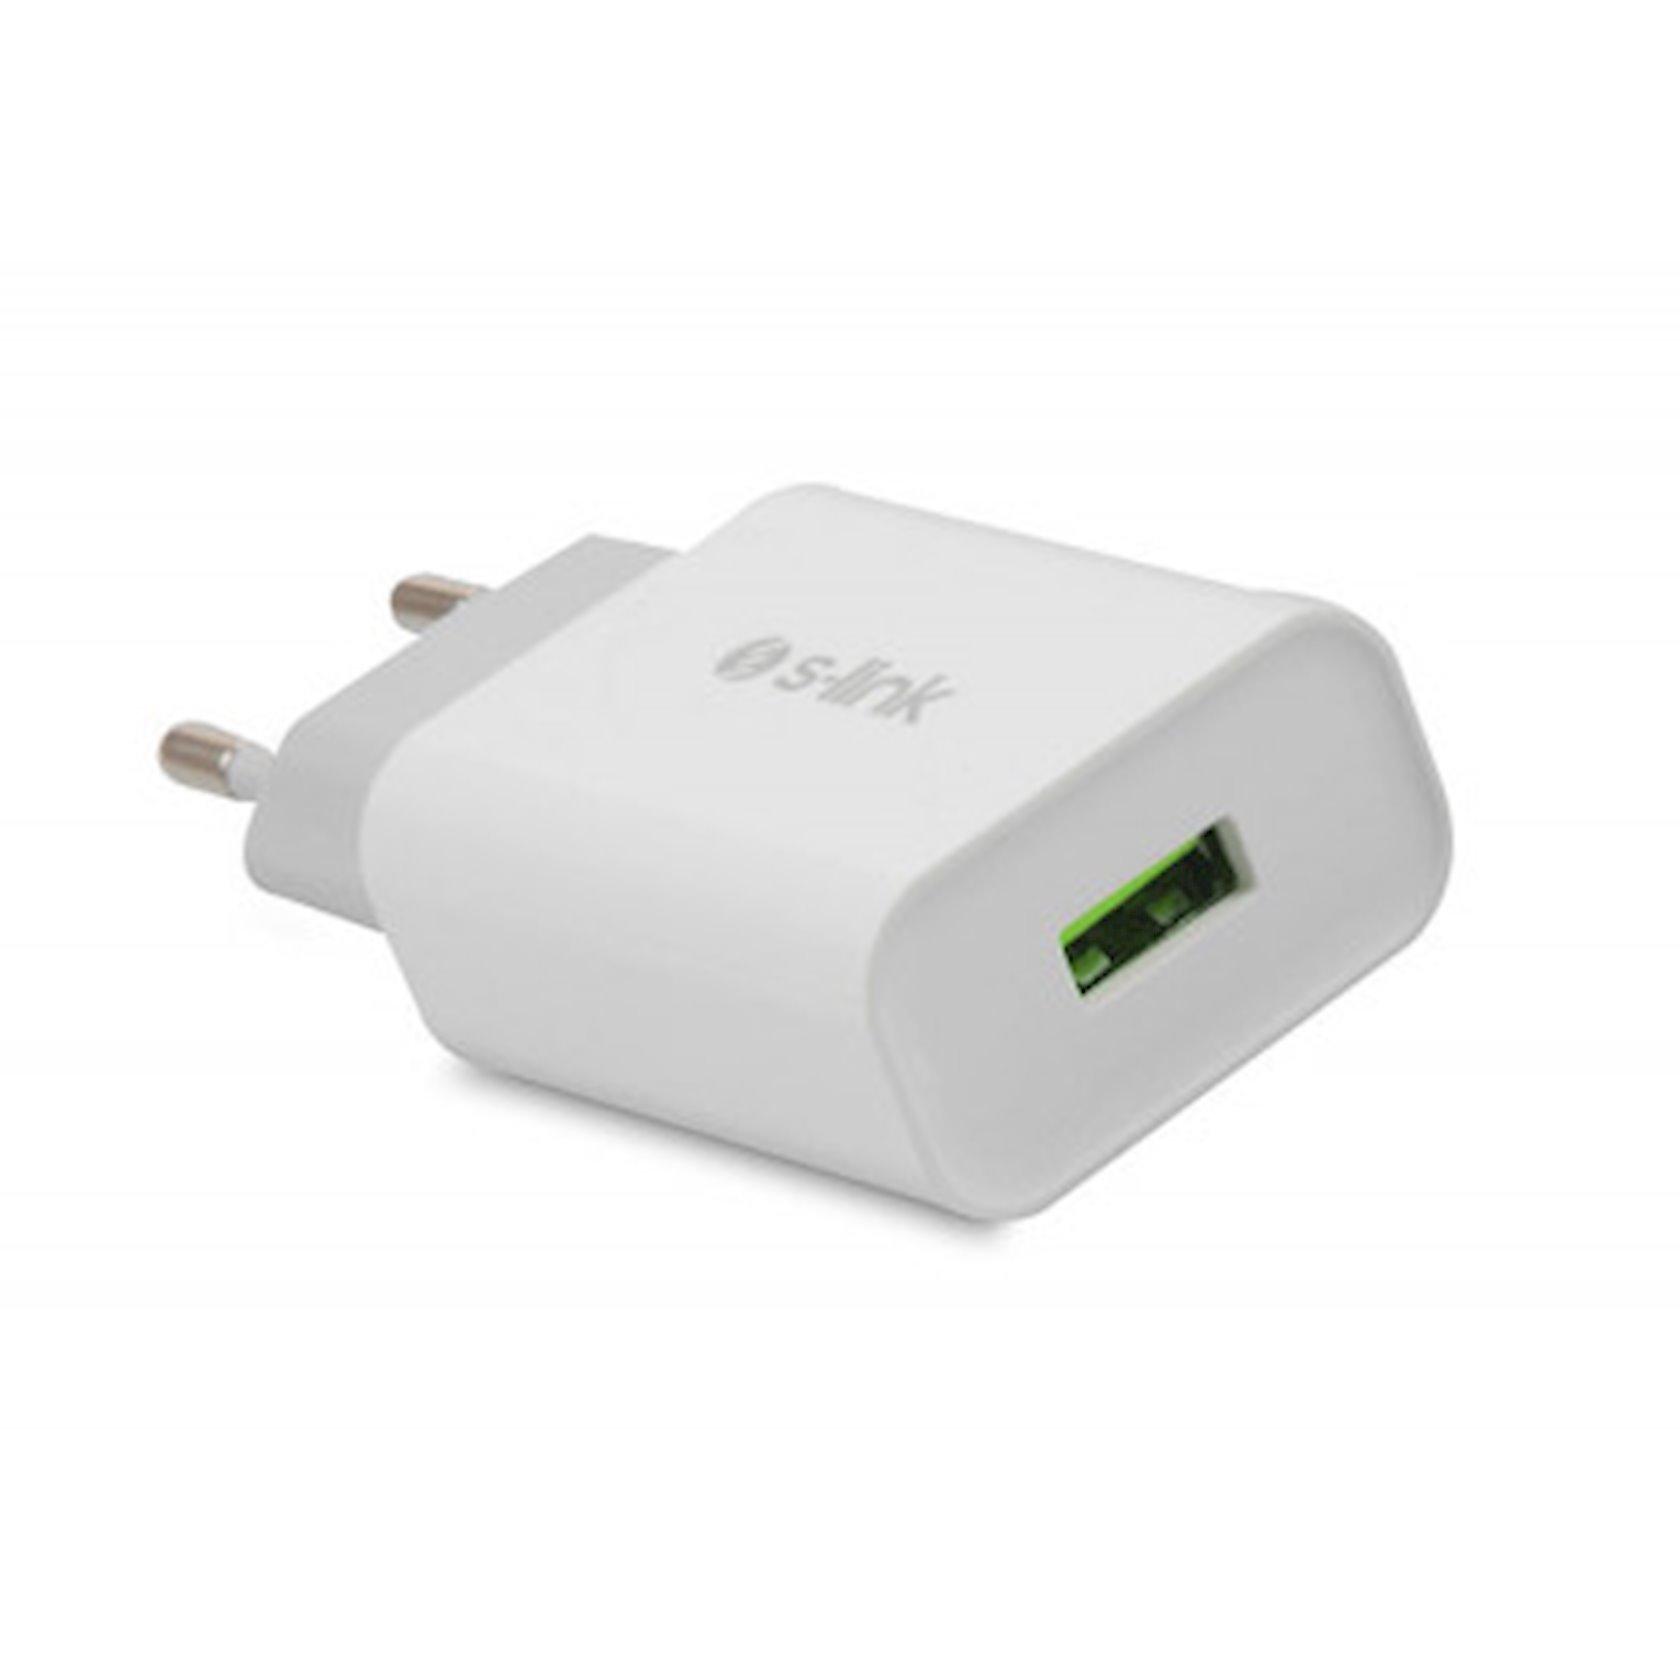 Enerji toplama cihazı S-link SL-EC10 1100MA Home White Charger Adapter